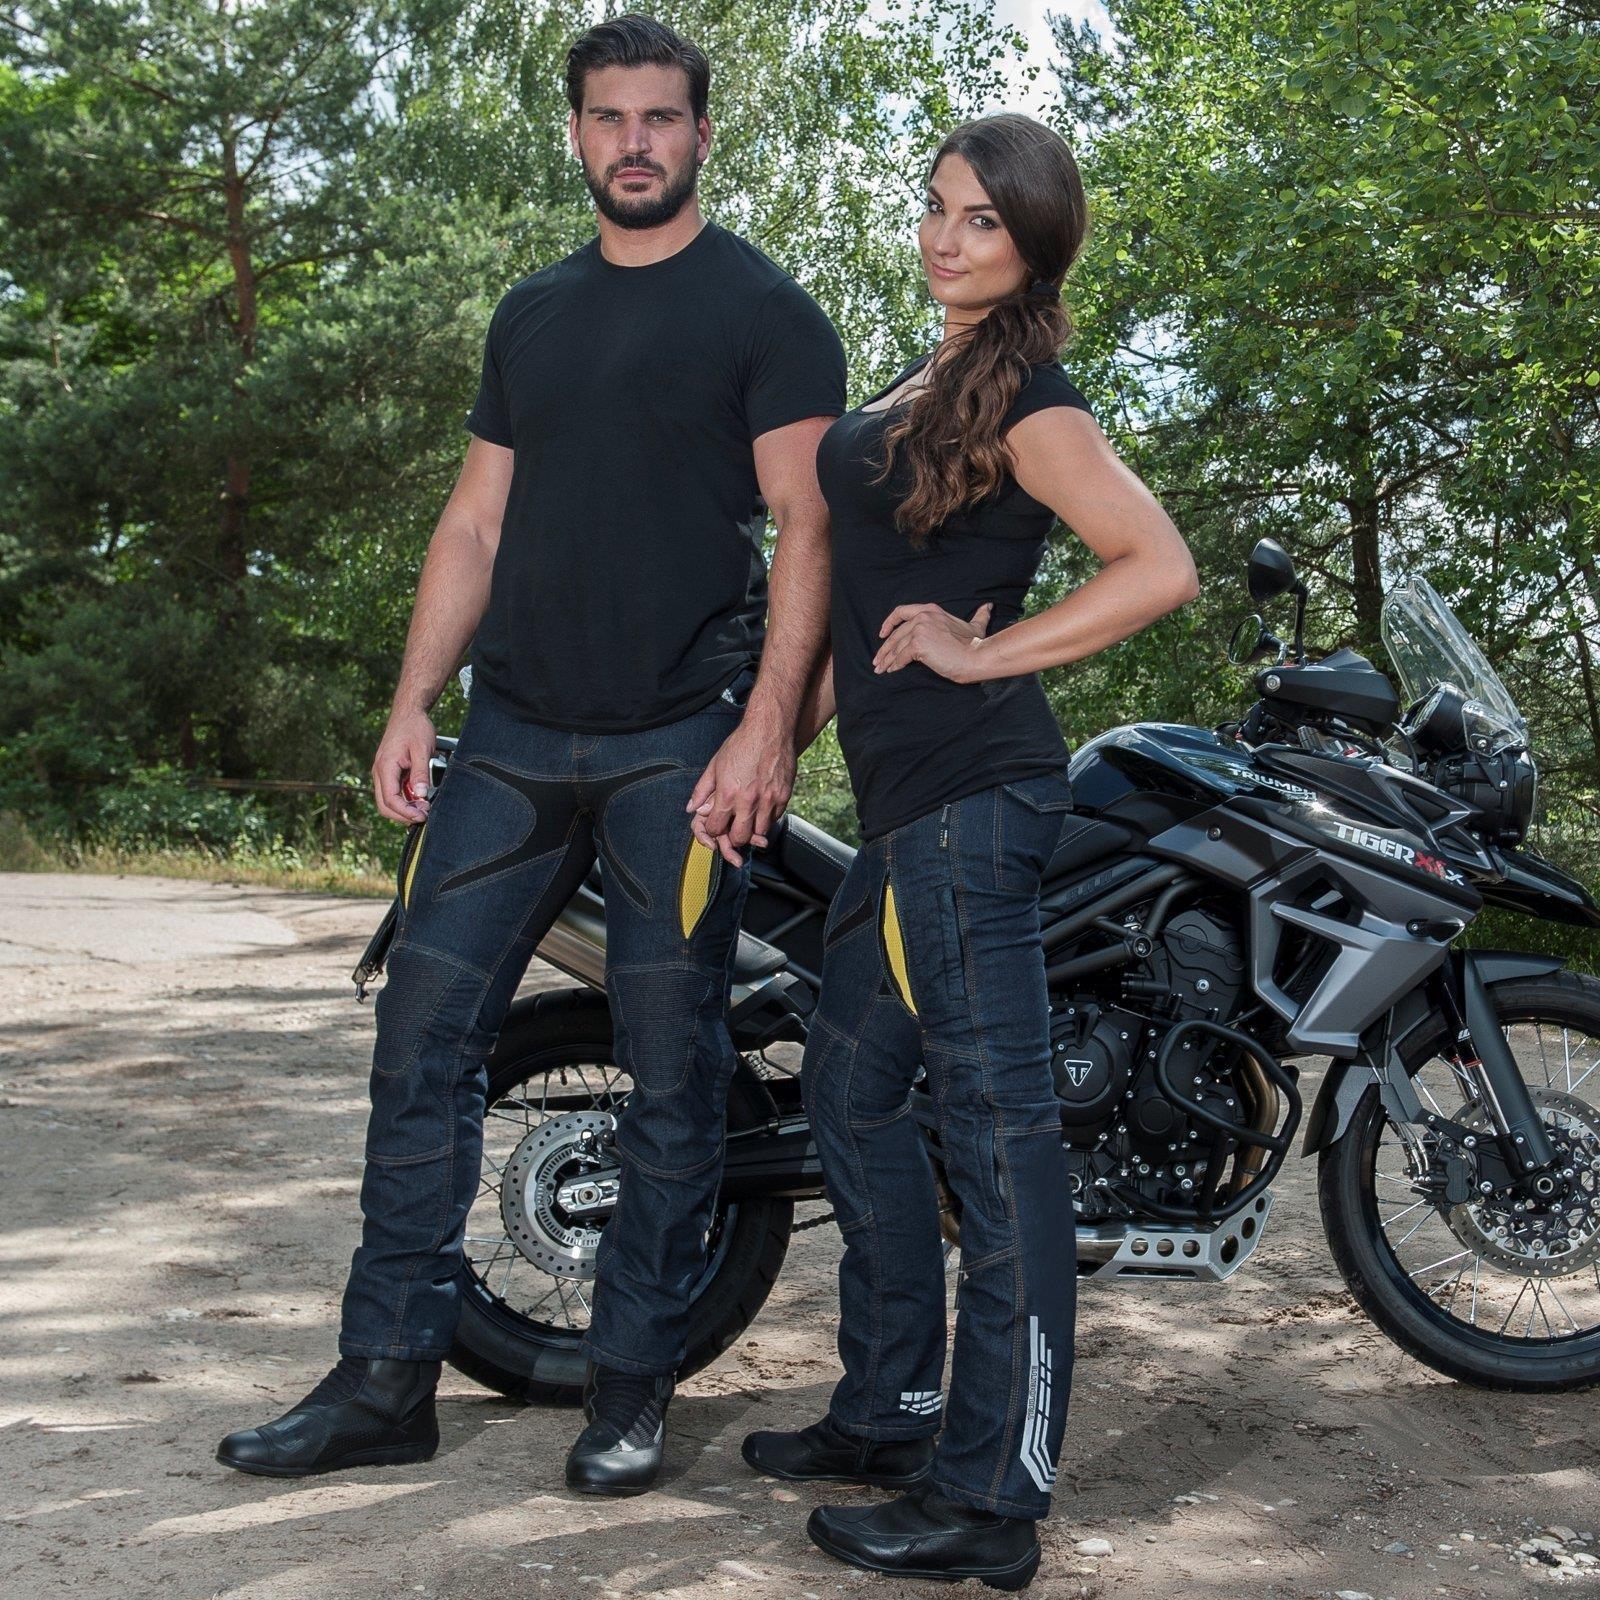 Trilobite-Pantaloni-Moto-Jeans-Abbigliamento-Parado-MICAS-URBAN-DUAL-PANTS-ACID miniatura 30